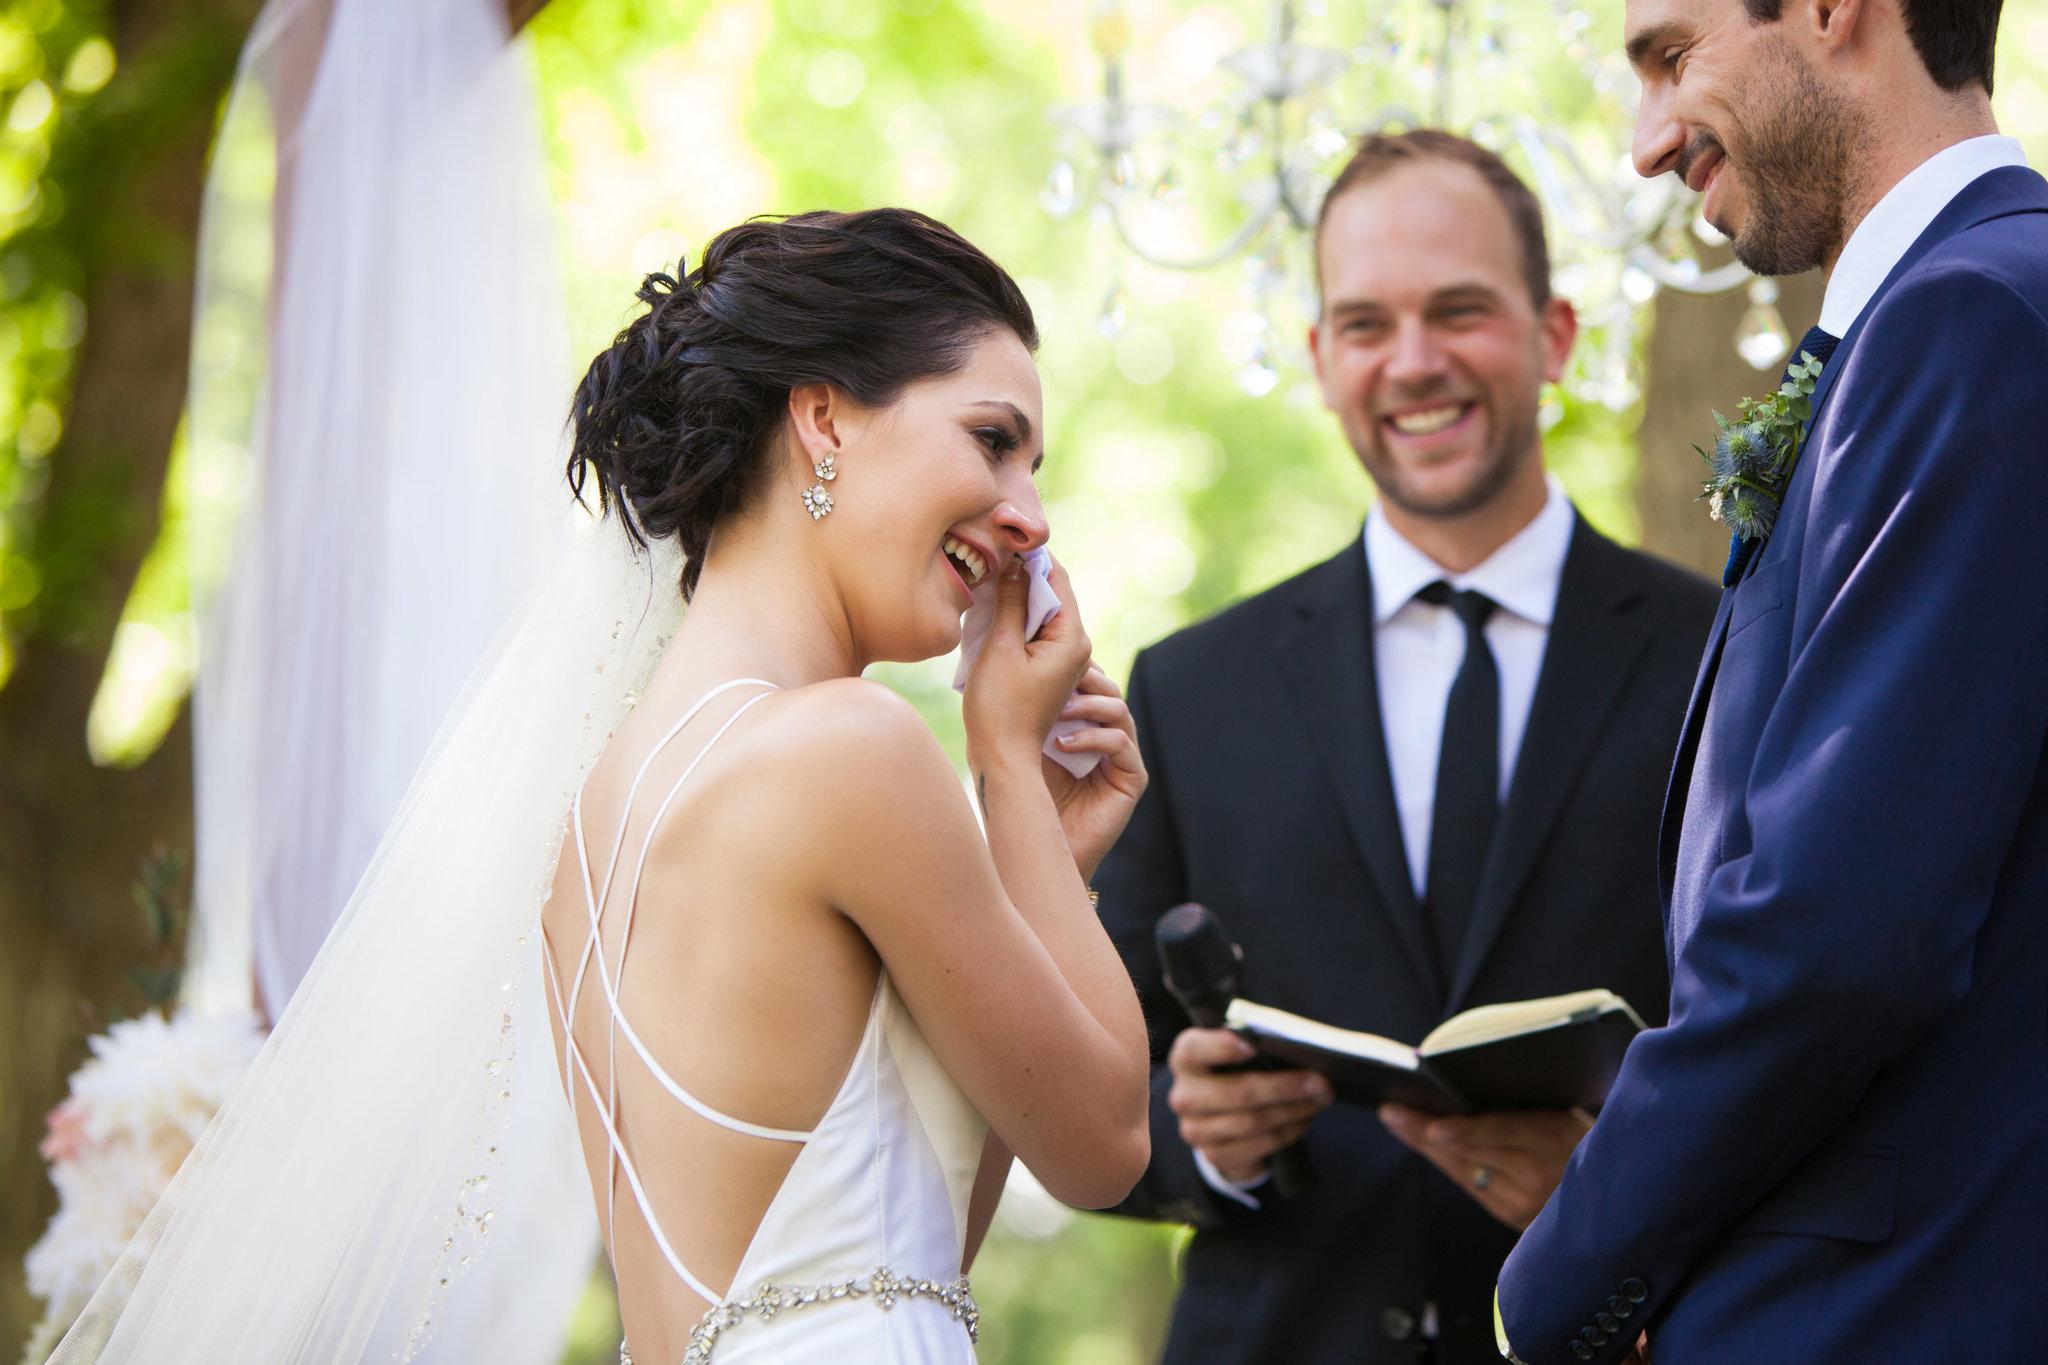 Chasing Autumn Photography, Medicine Hat Photography, Medicine Hat Wedding Photographer, Beveridge Landmark Events, Saskatchewan Wedding Photographer, Southern Alberta Wedding